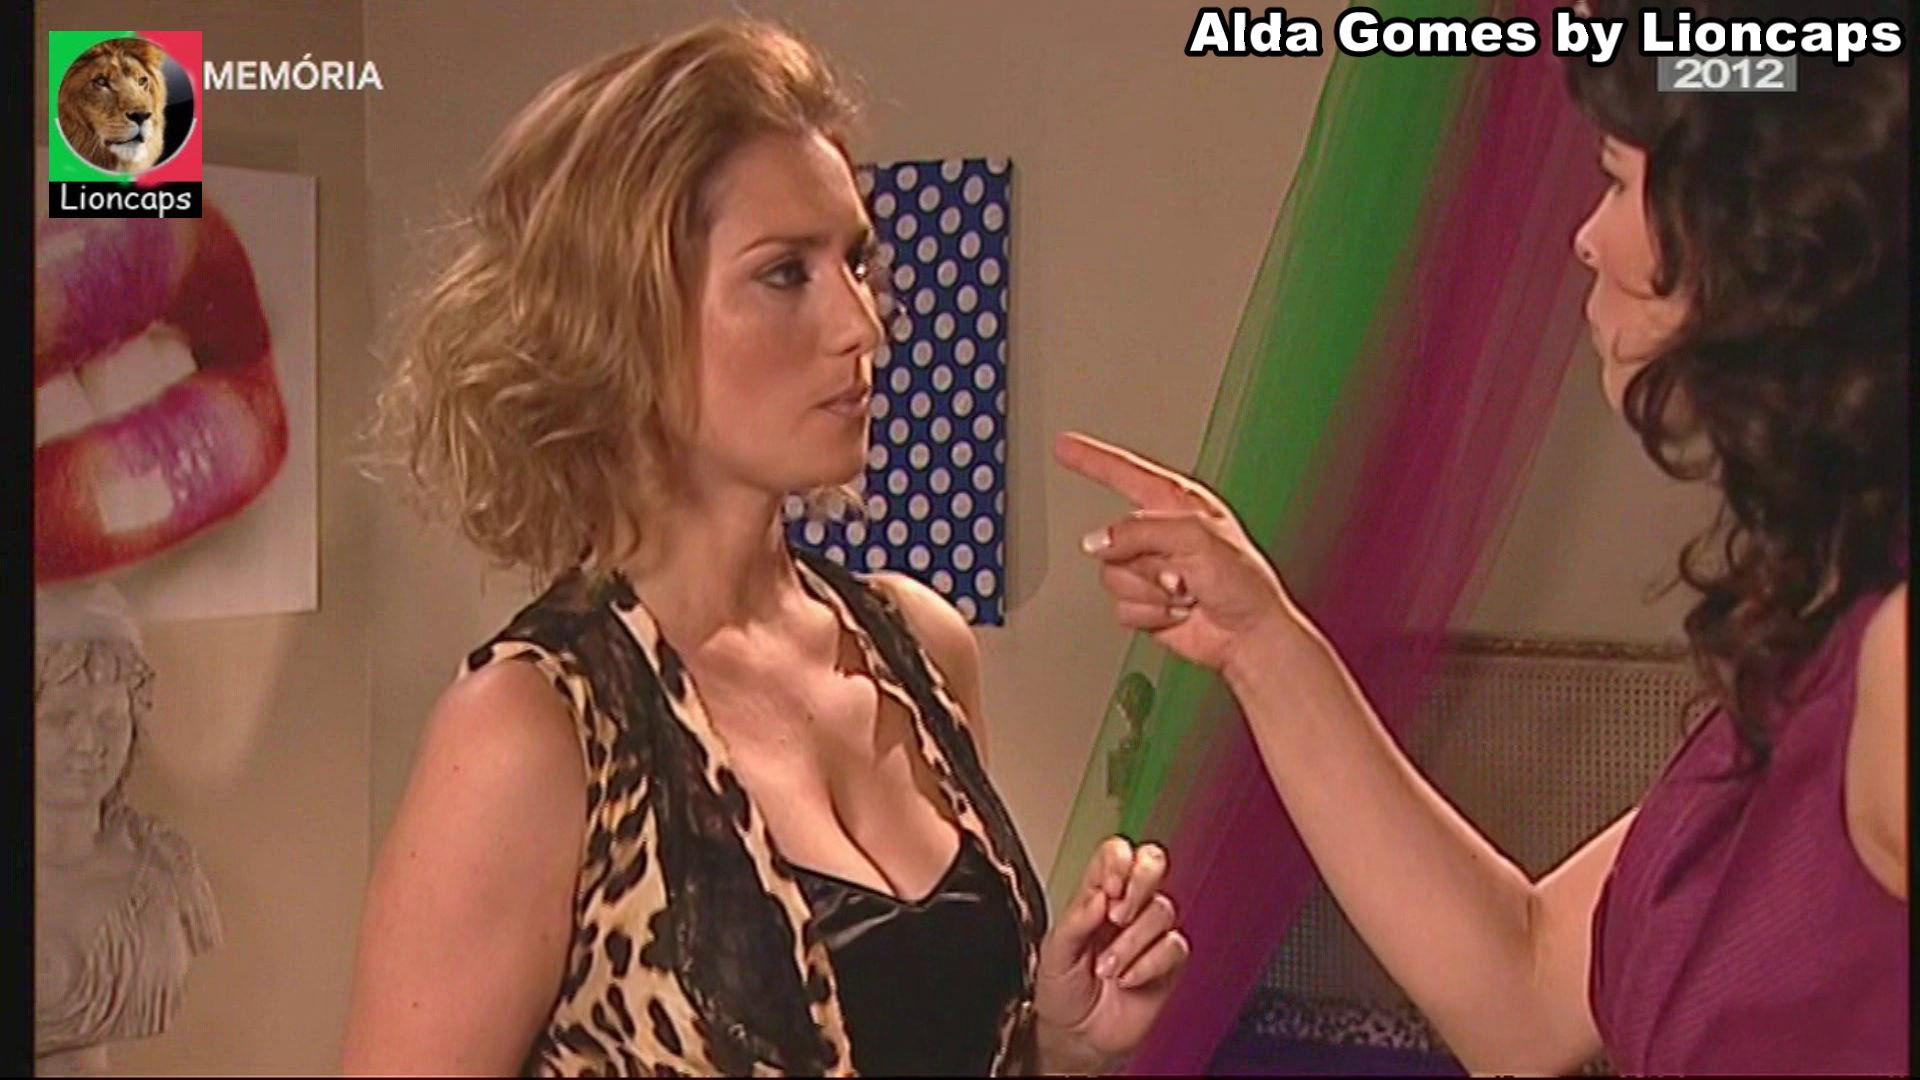 995559972_alda_gomes_vs181228_0247_122_137lo.JPG